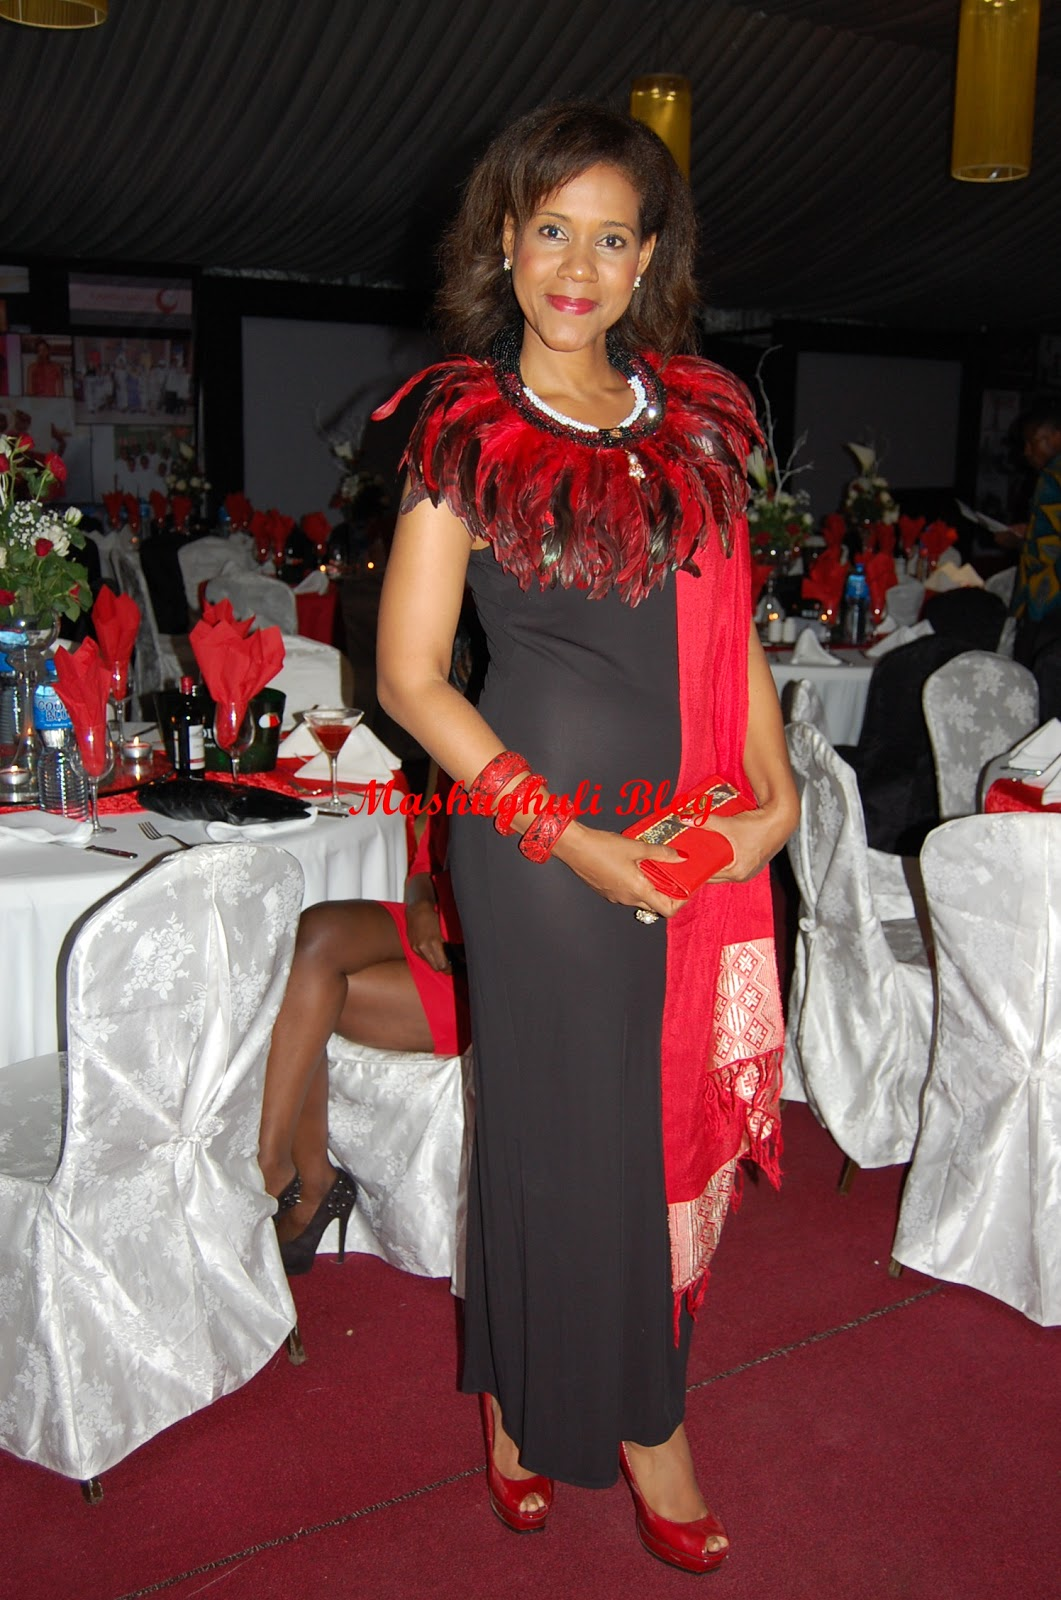 Mashughuli Blog: Red Carpet Red Ribbon Fashion Gala Serena Hotel 2012